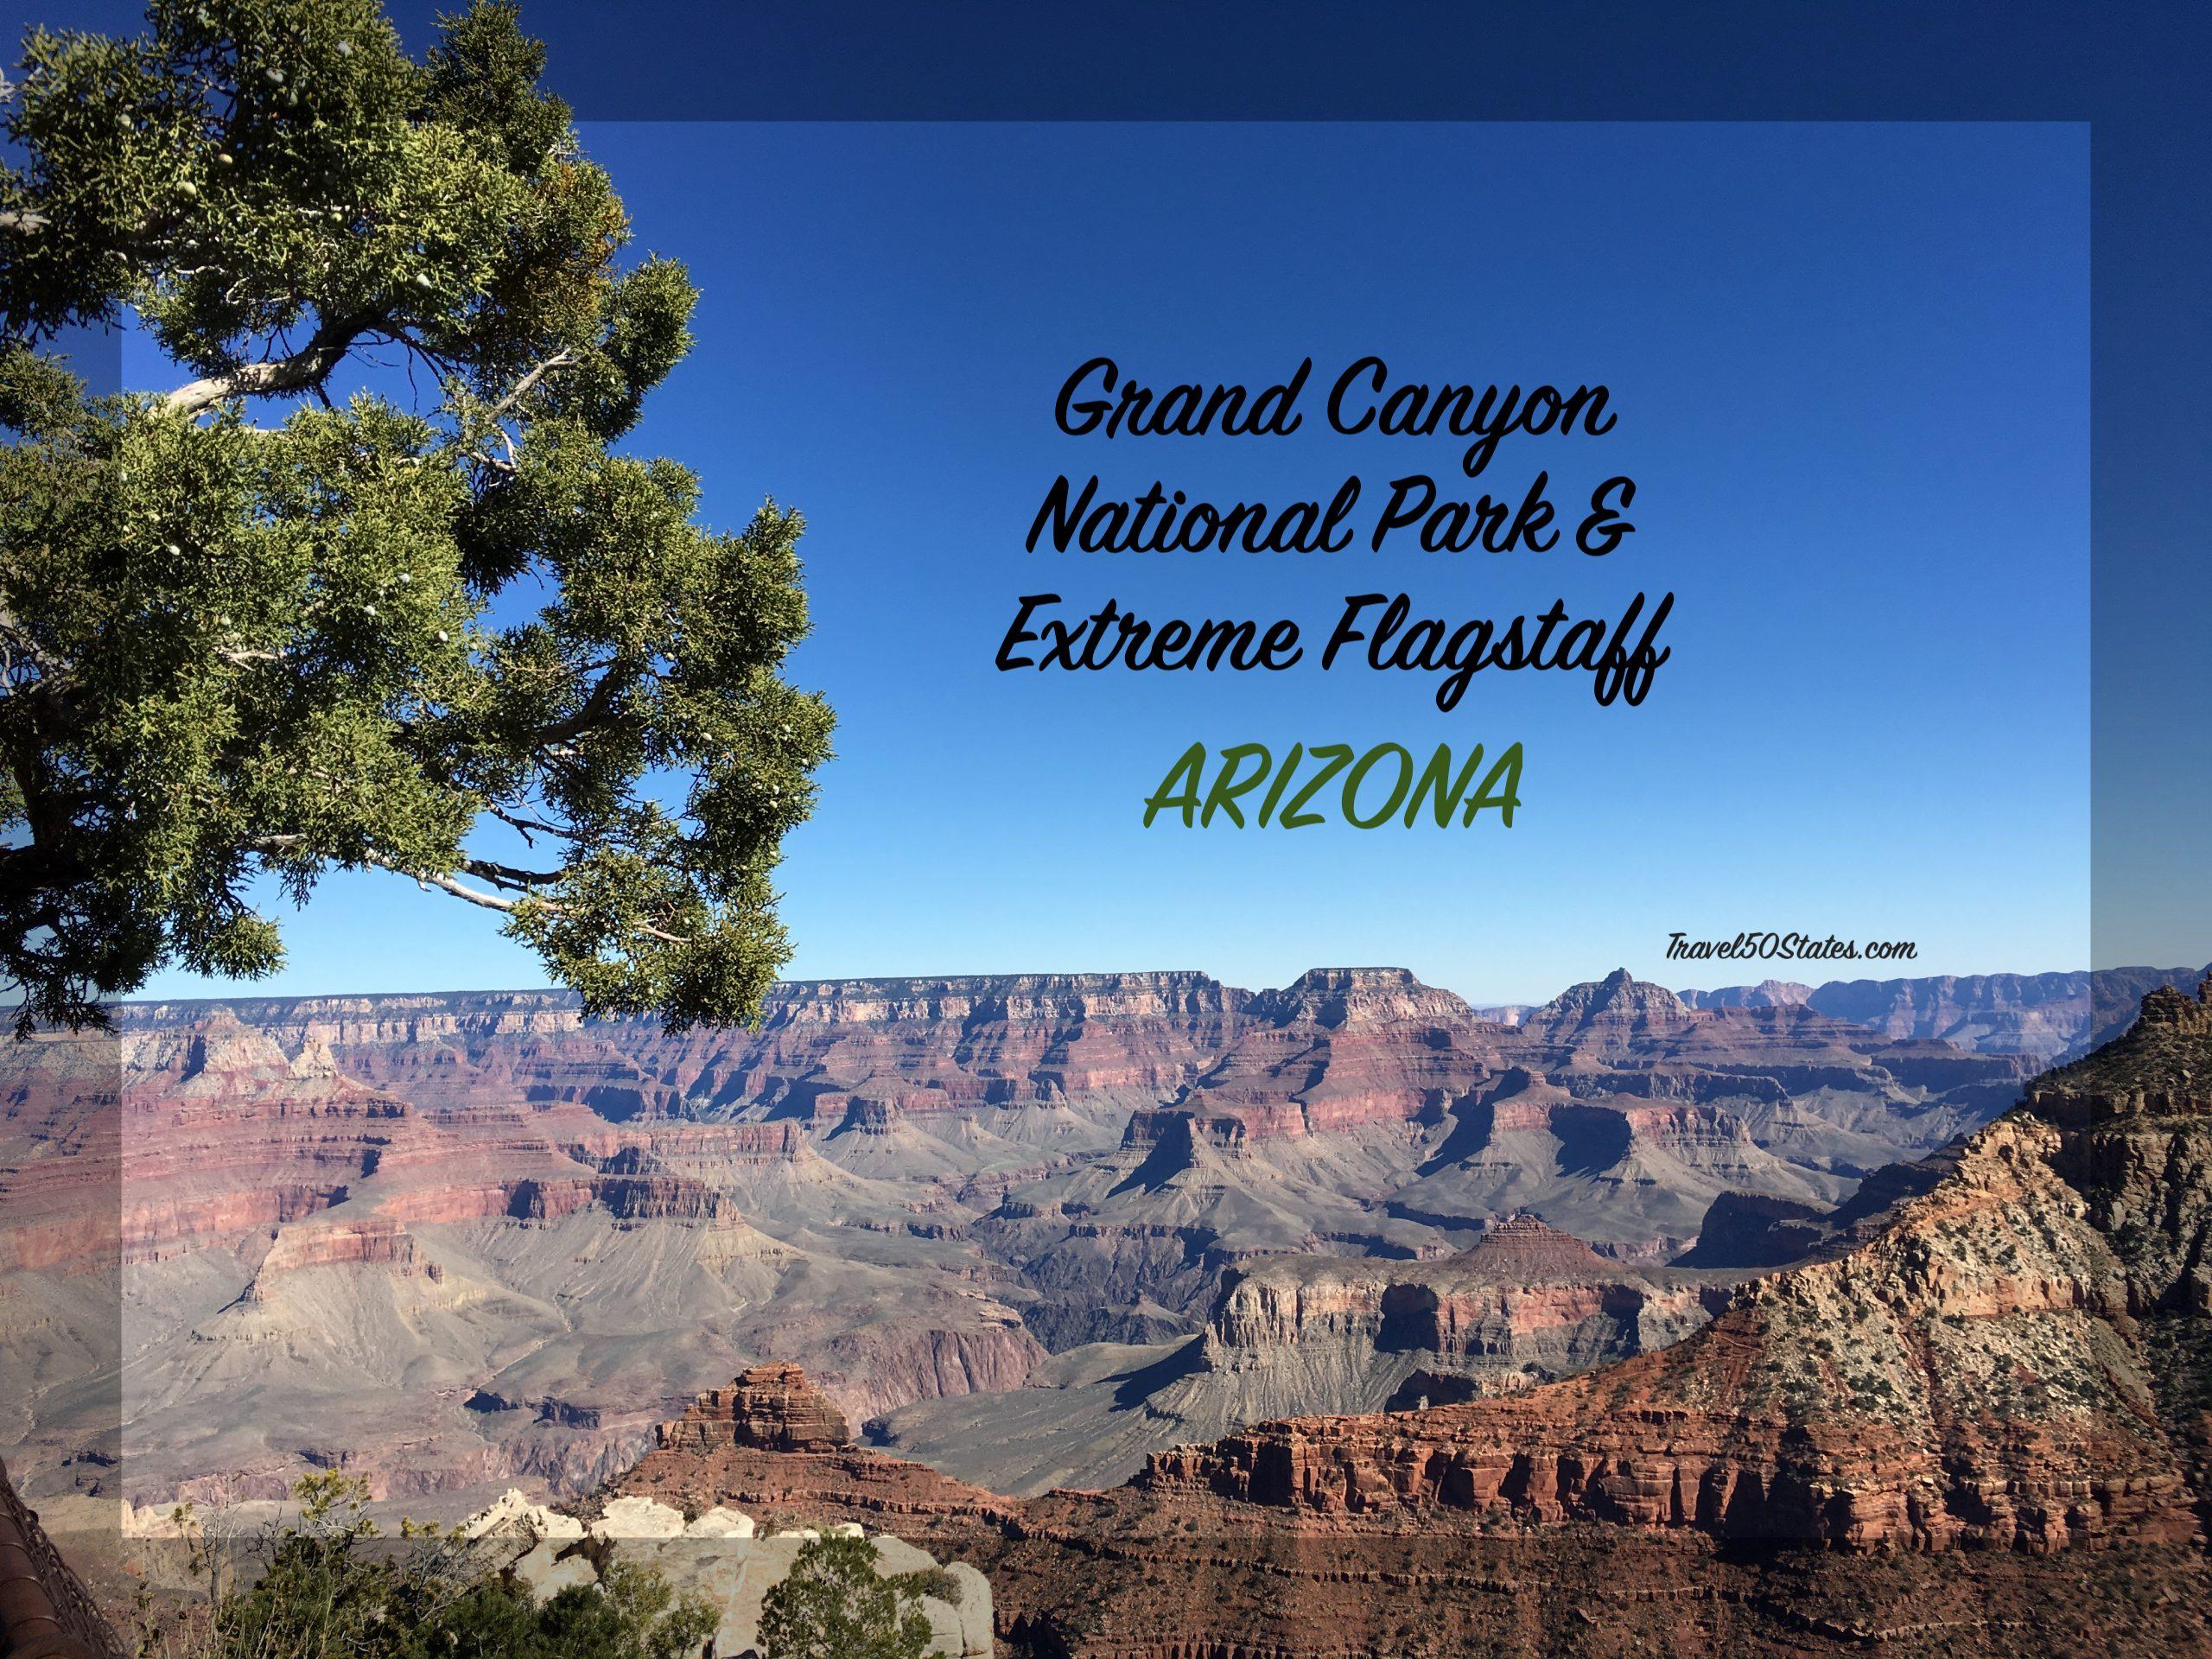 Grand Canyon National Park & Extreme Flagstaff, Arizona